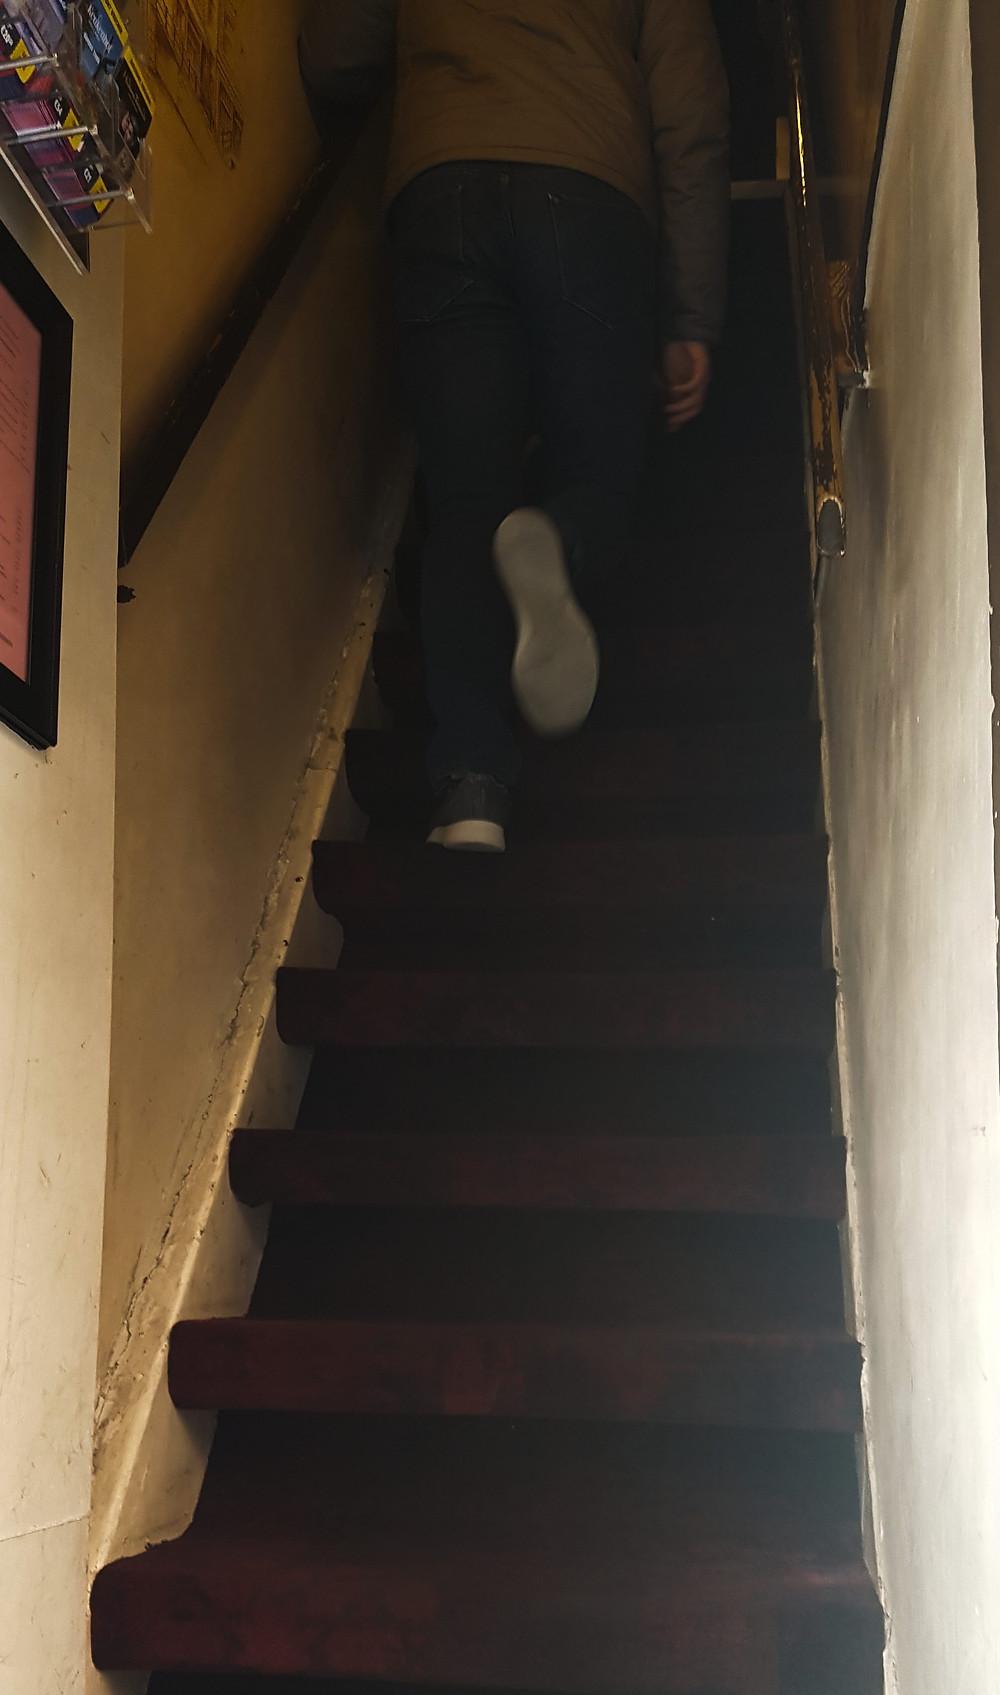 Estreita escada que leva ao restaurante Pannenkoekenhuis Upstairs, em Amsterdam, Holanda.